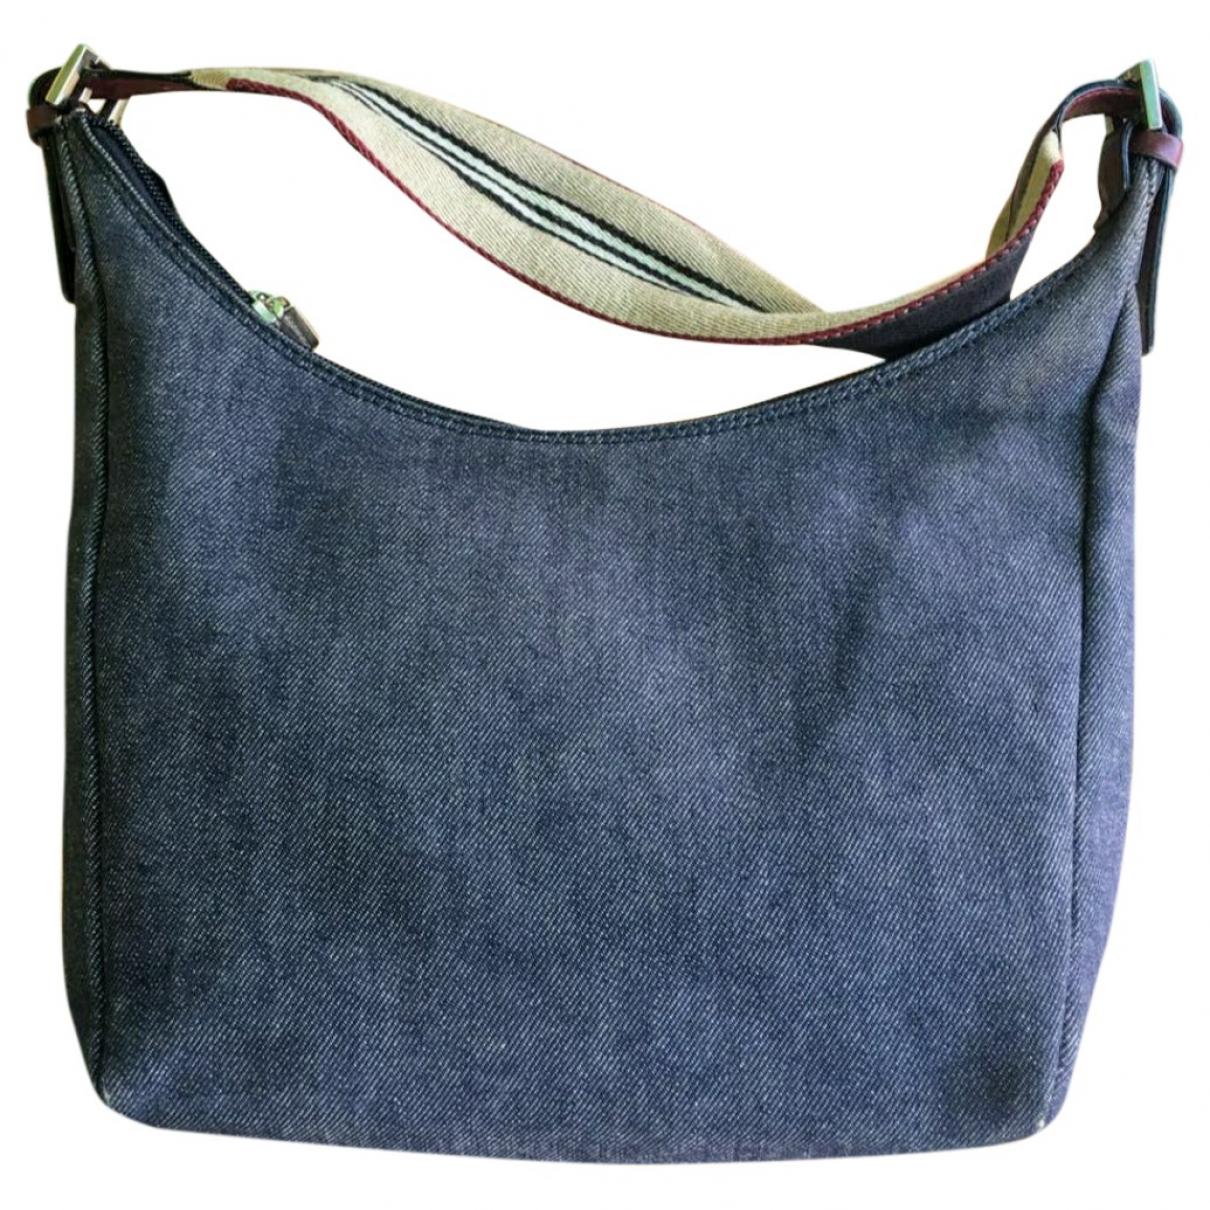 Burberry \N Handtasche in  Blau Denim - Jeans